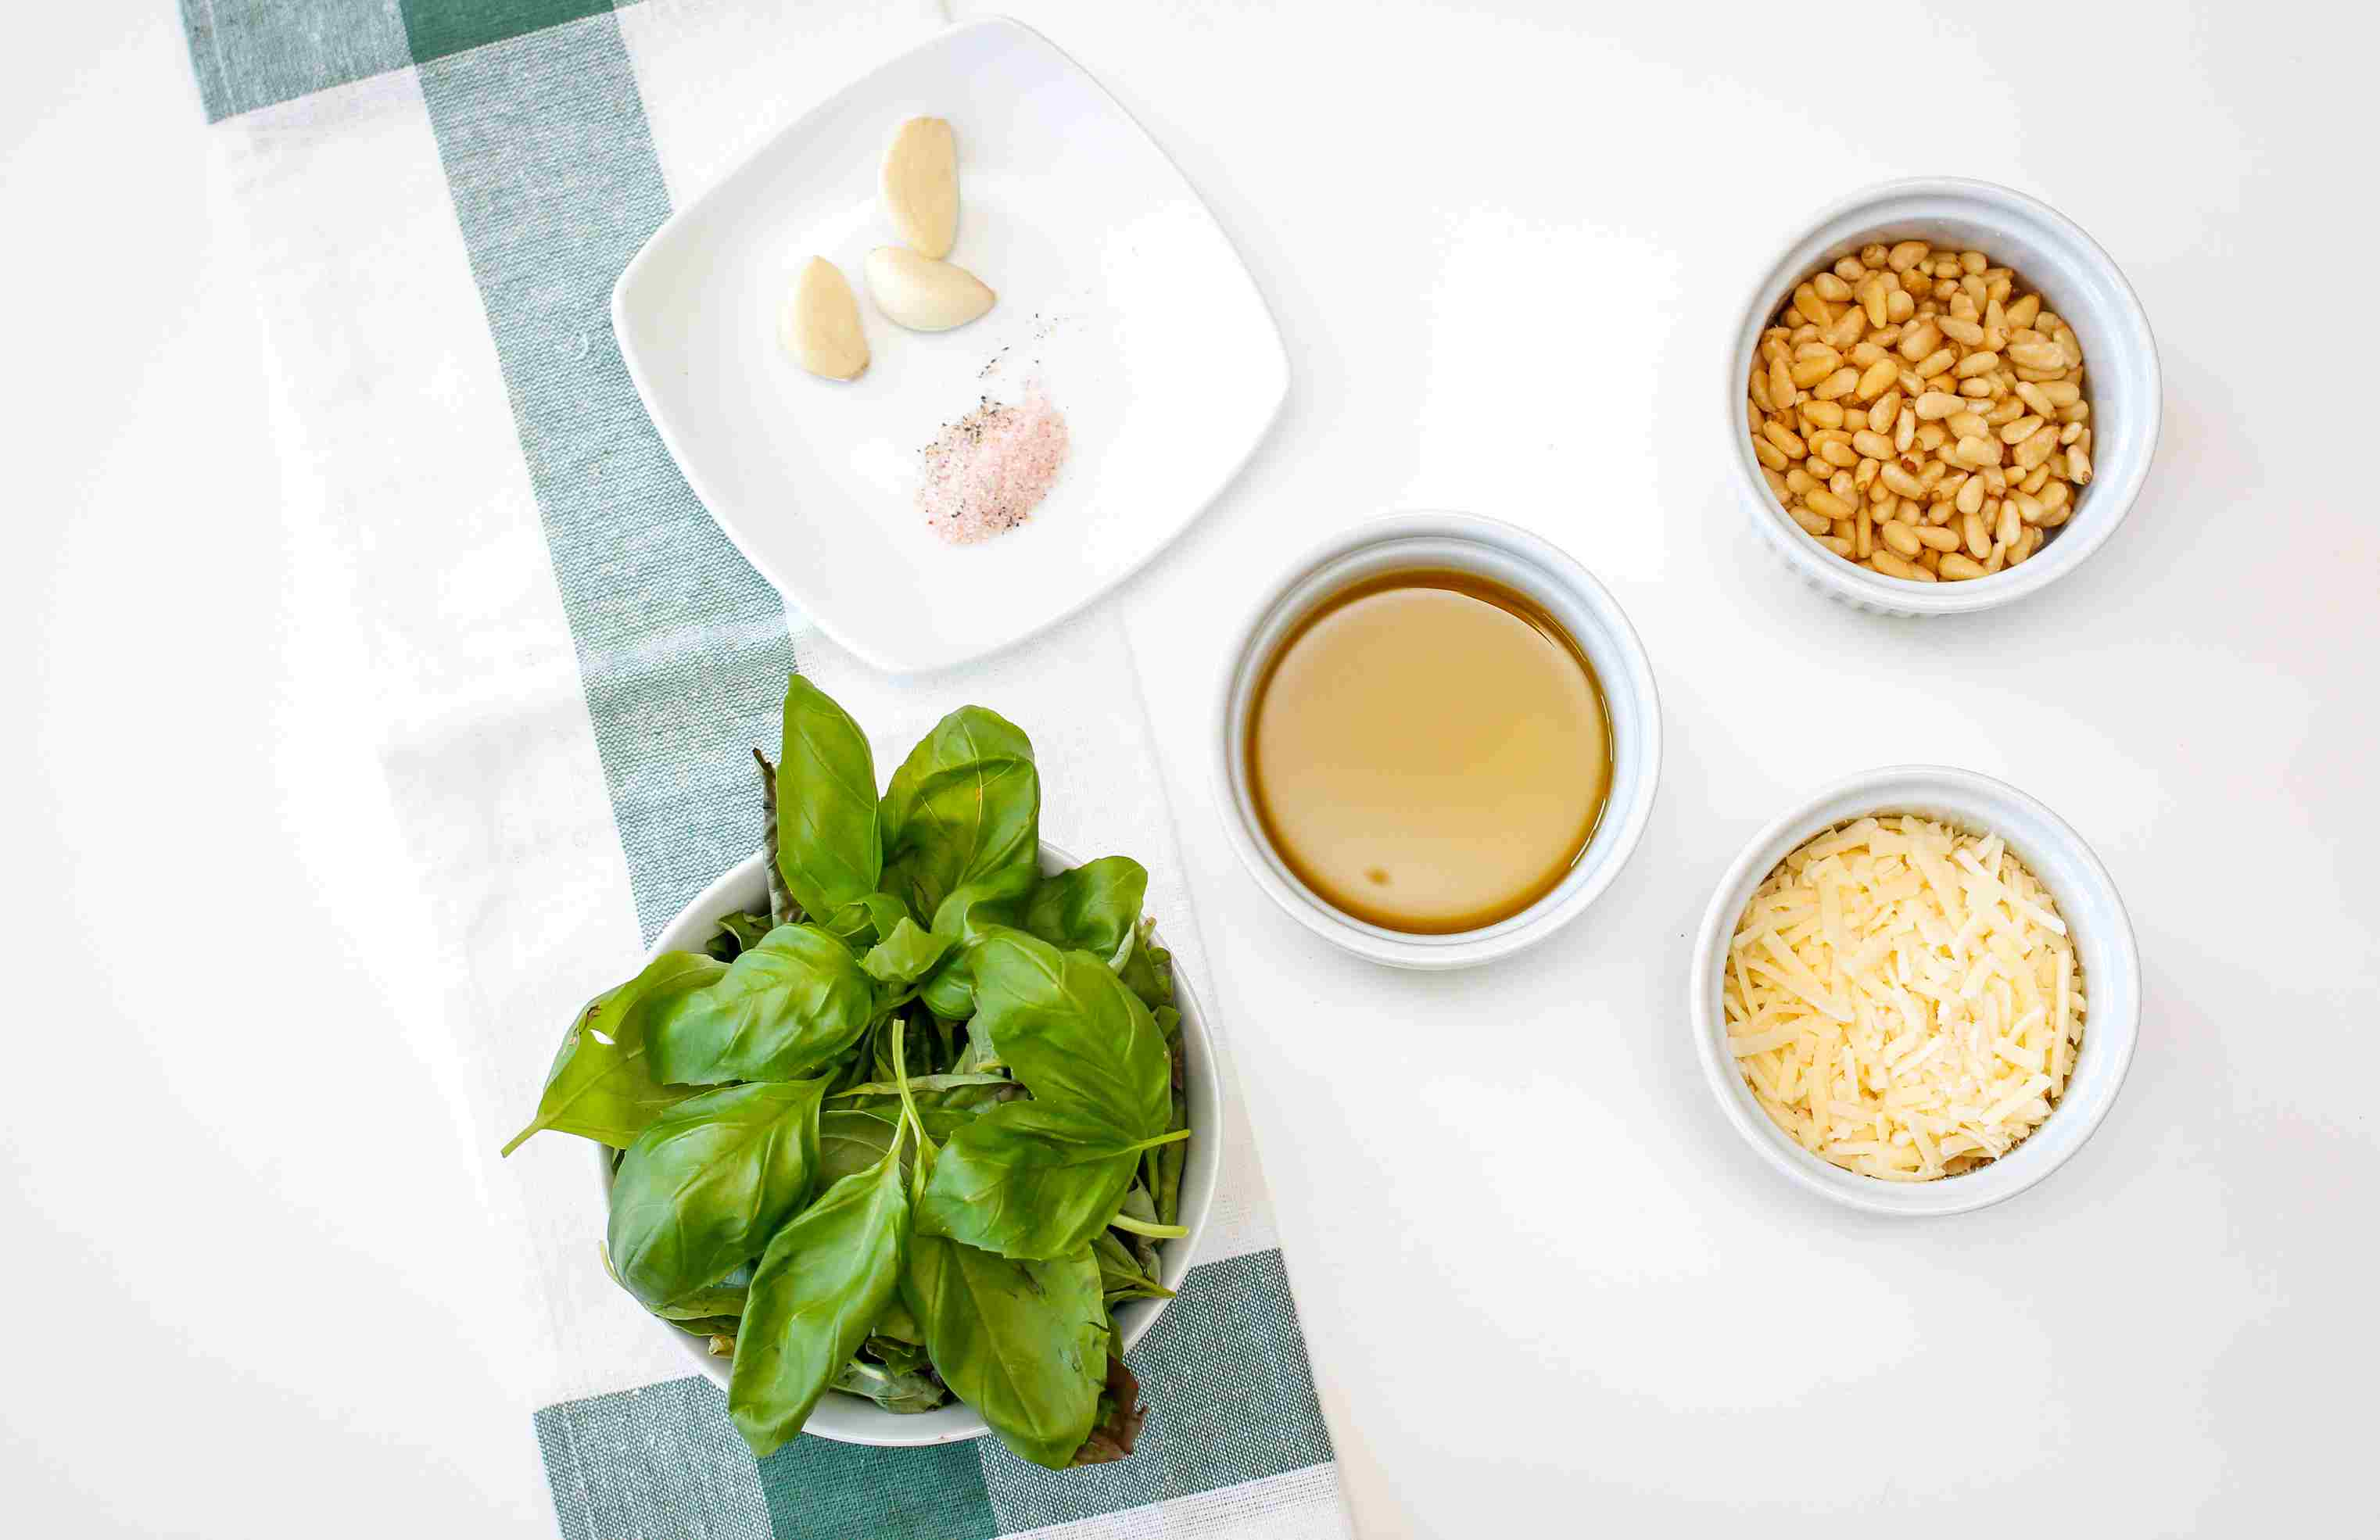 Ingredients for classic basil pesto sauce